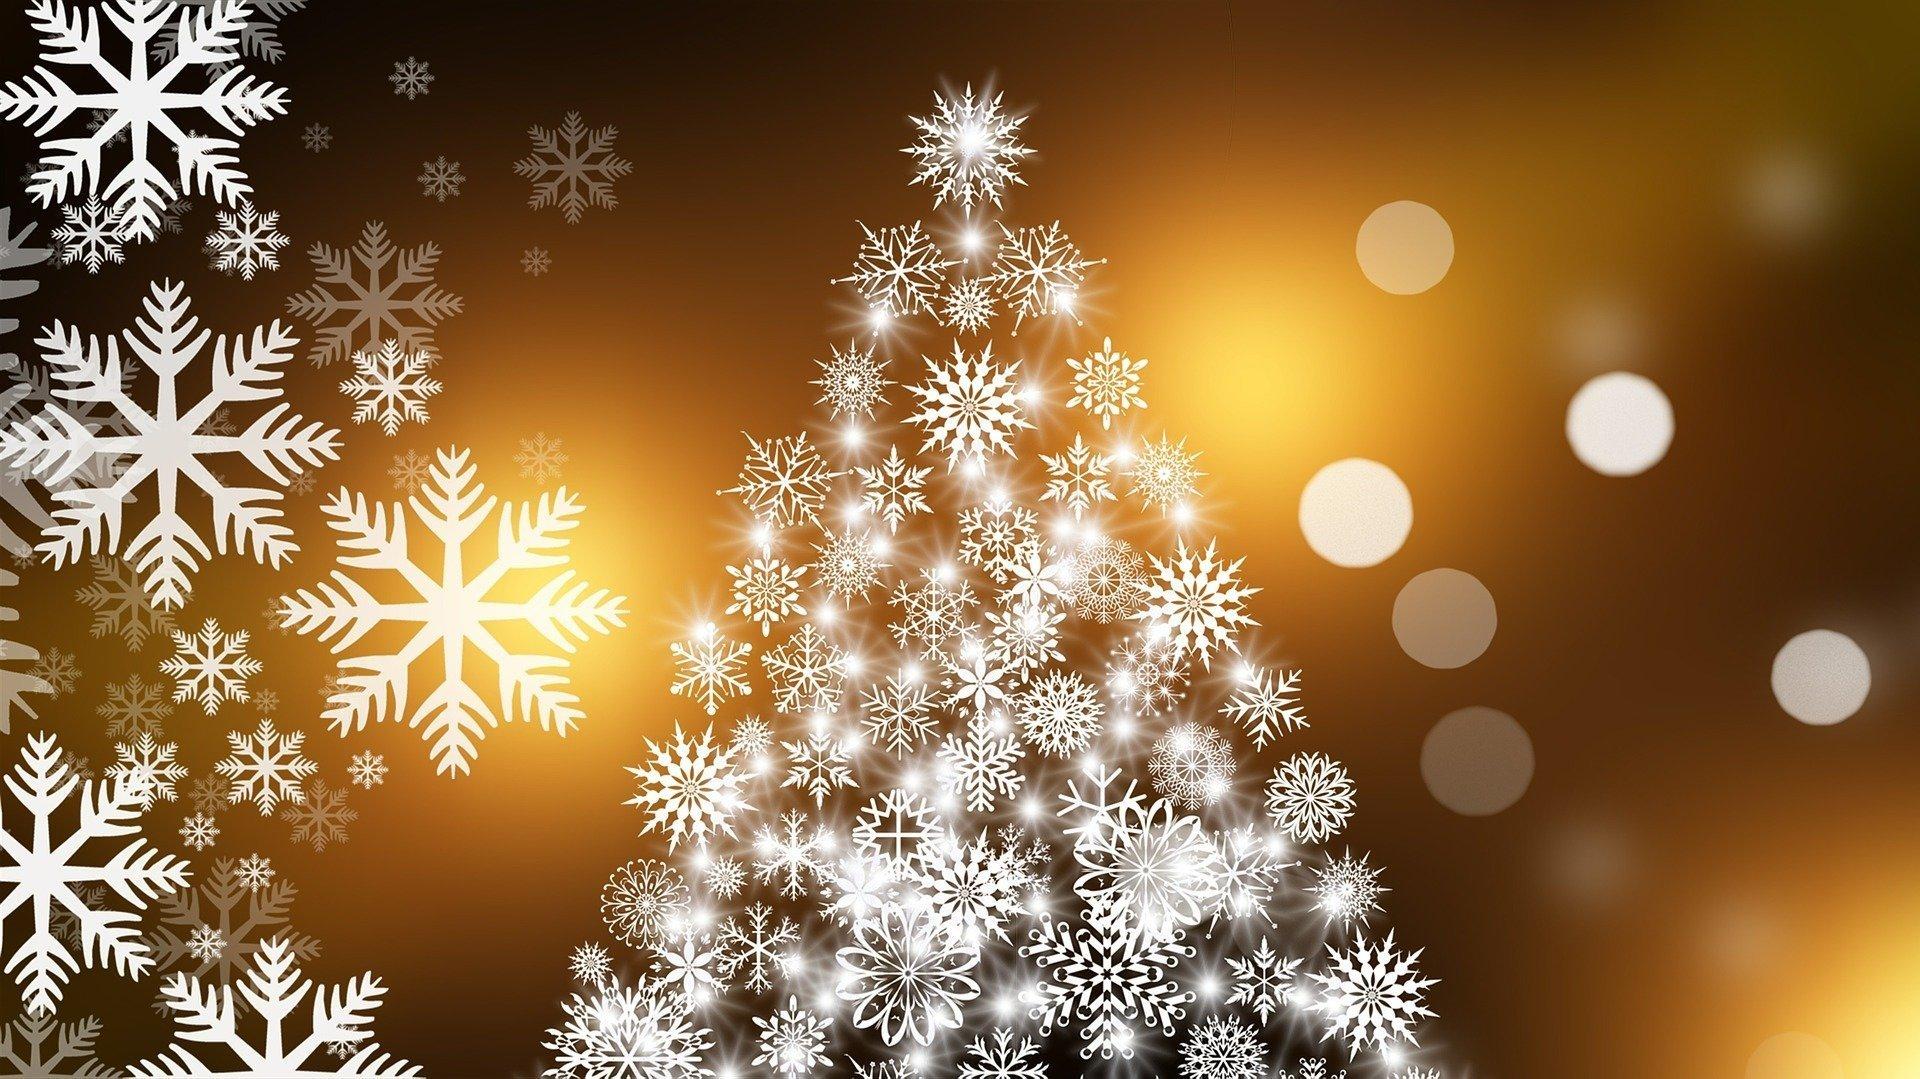 Astonishing Christmas records